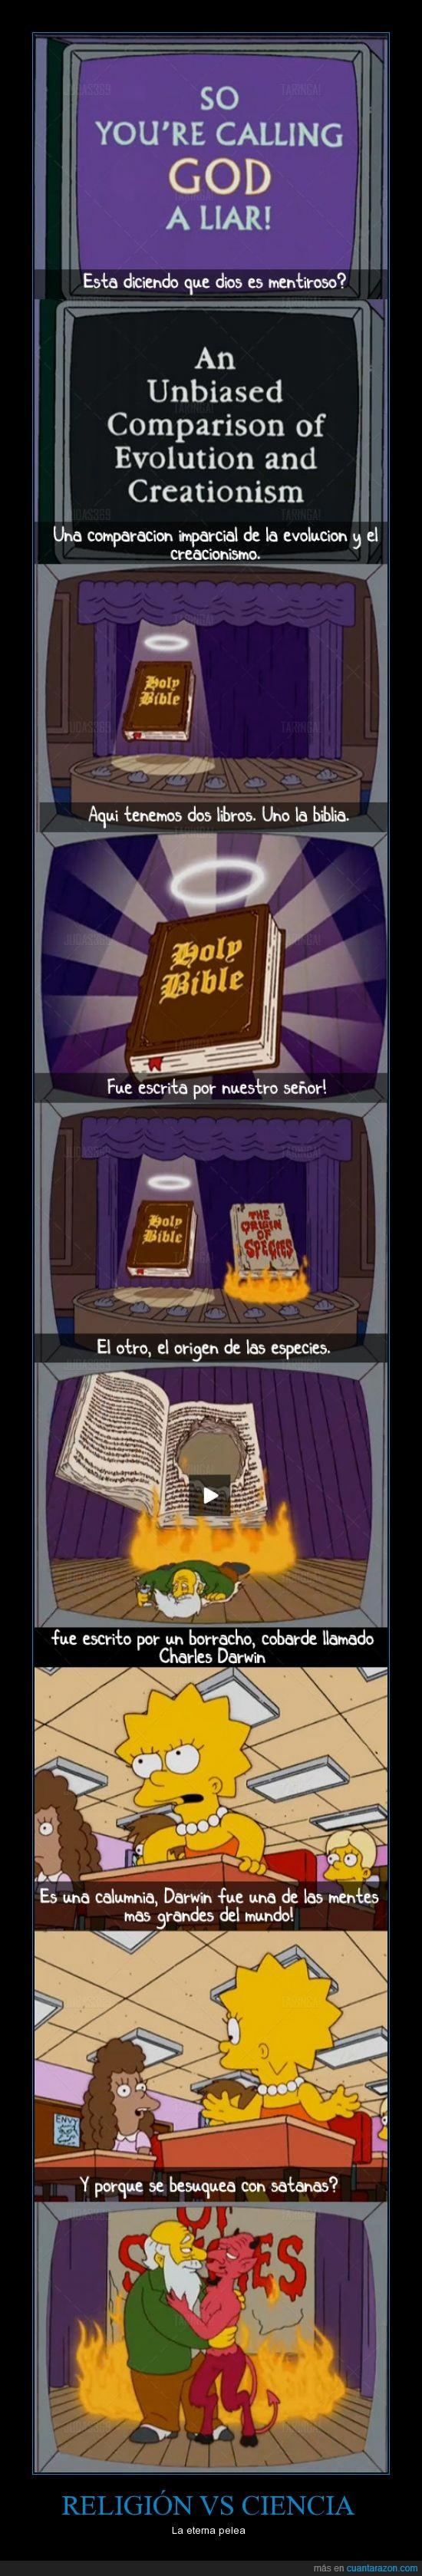 CR_790746_religion_vs_ciencia